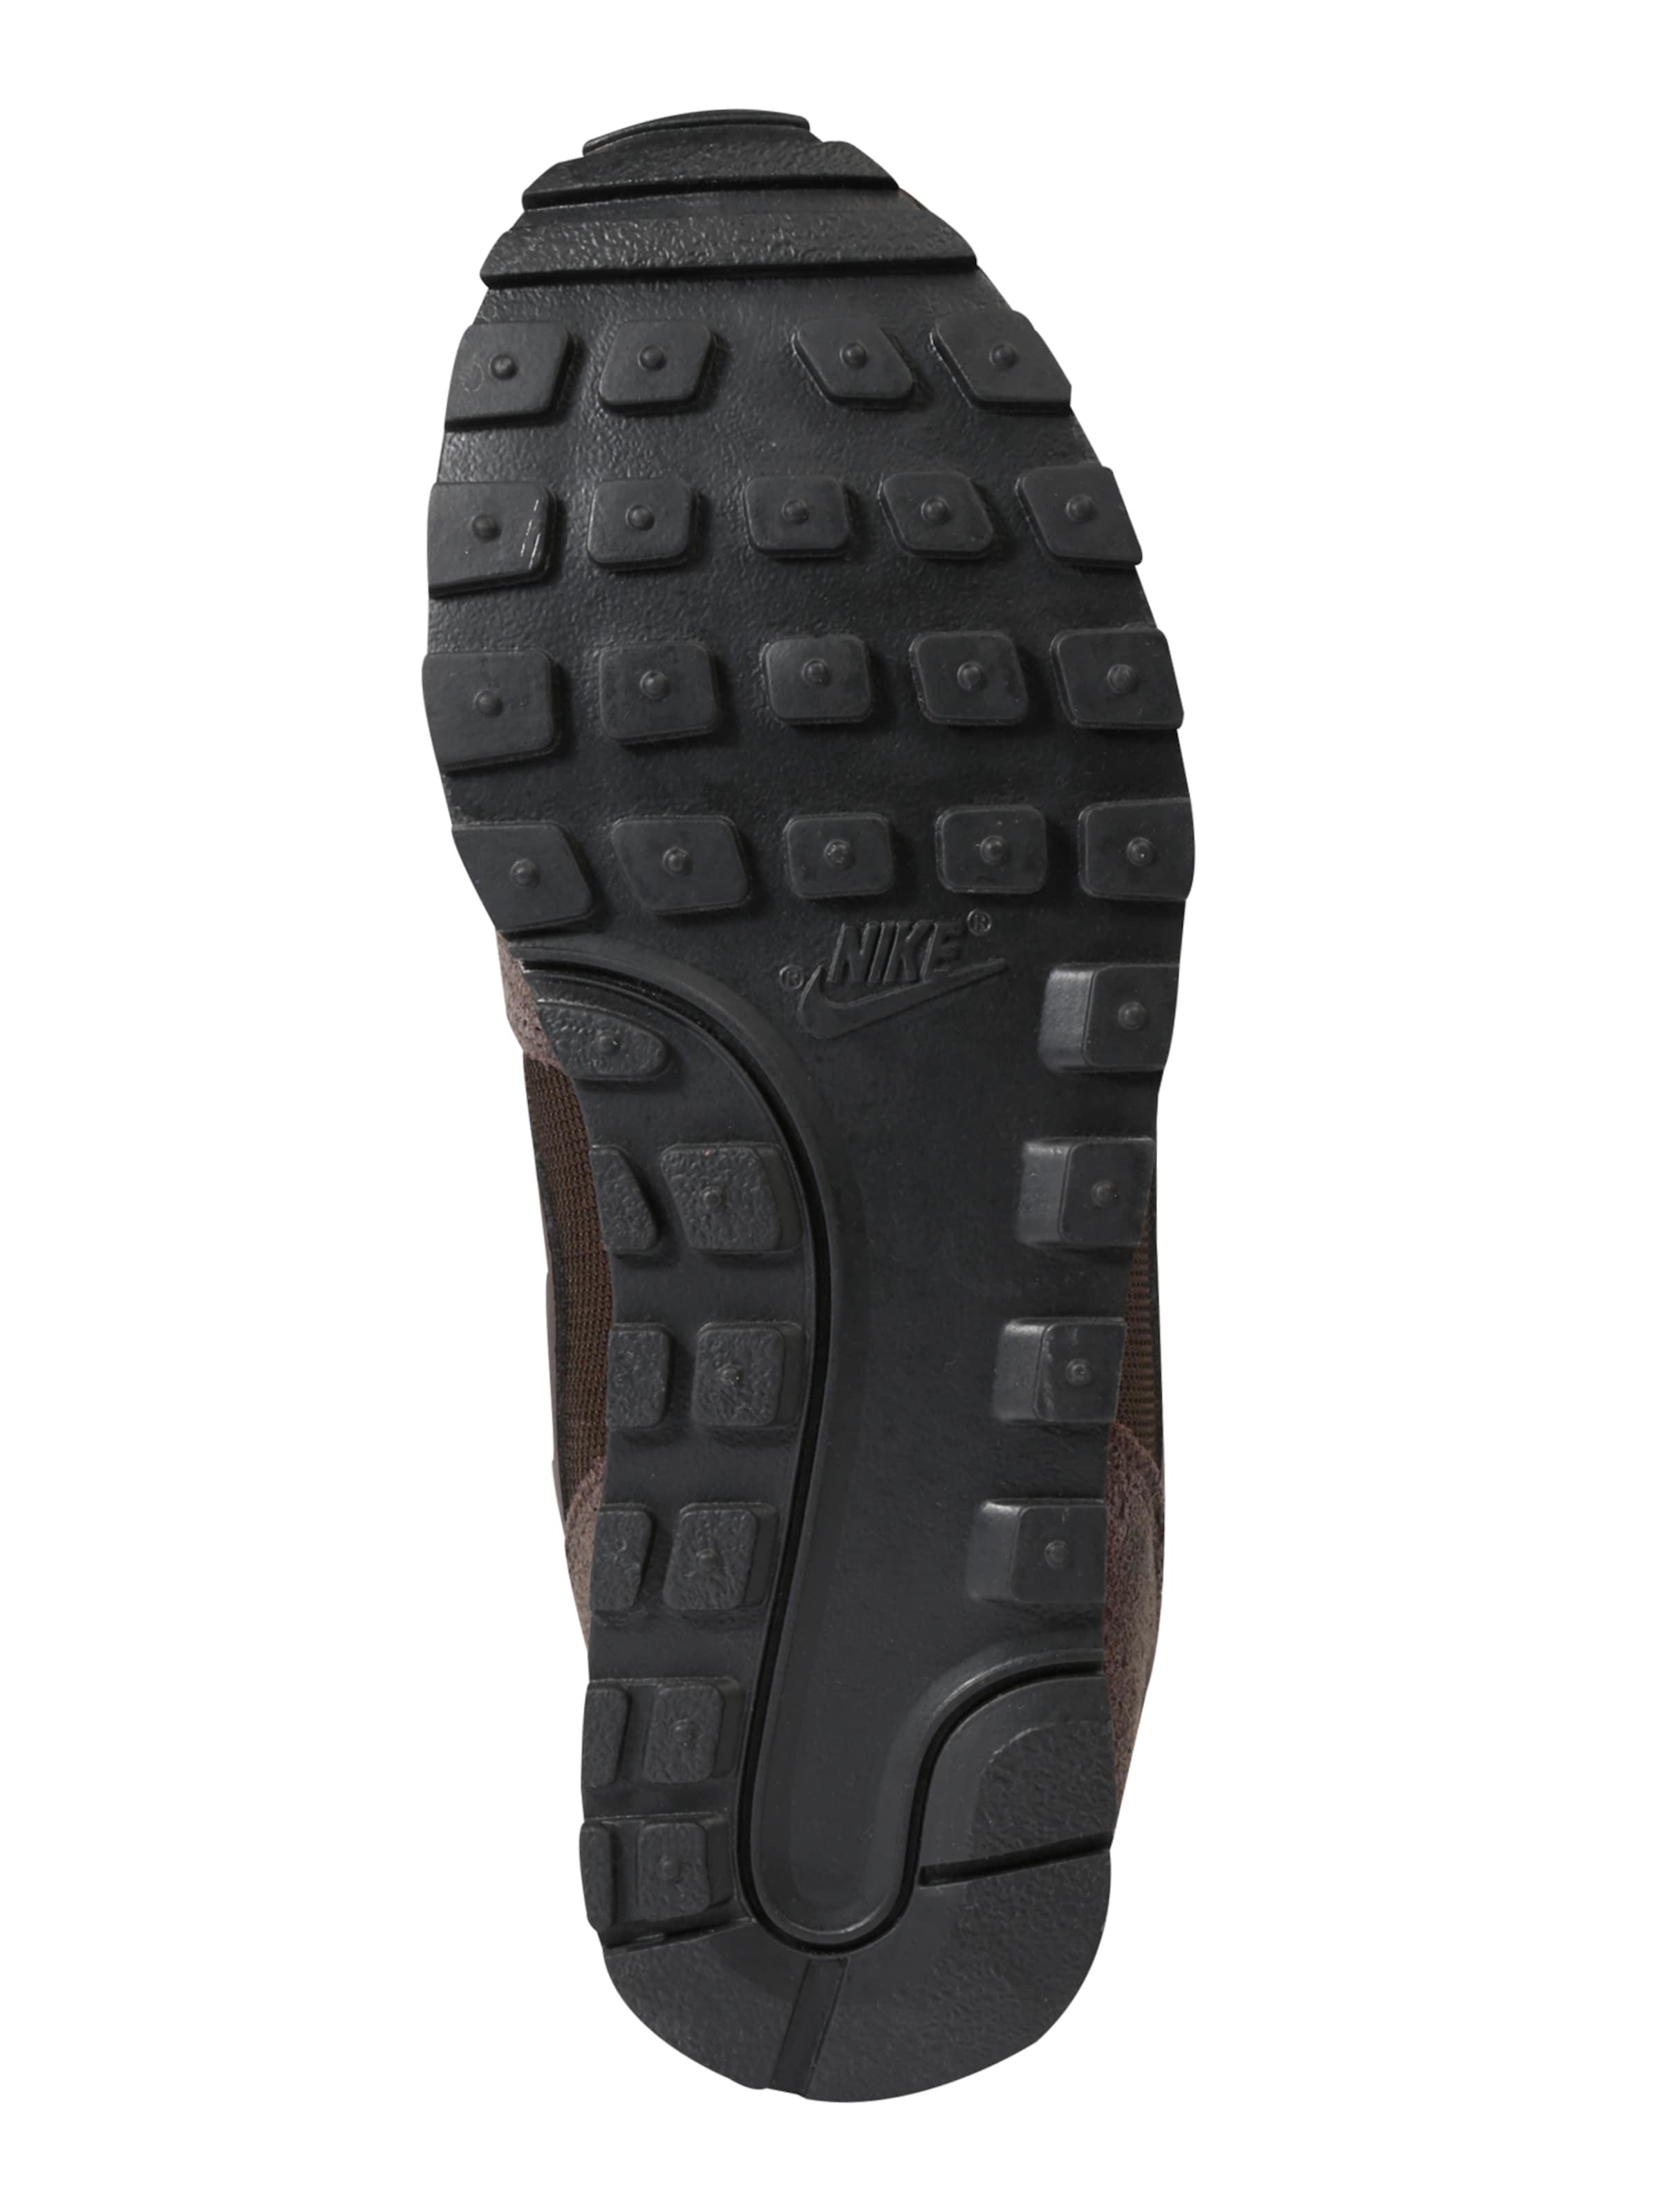 Nike Sportswear Turnschuhe Low 'Runner 2 Leder, Textil Textil Textil Bequem, gut aussehend 276b53